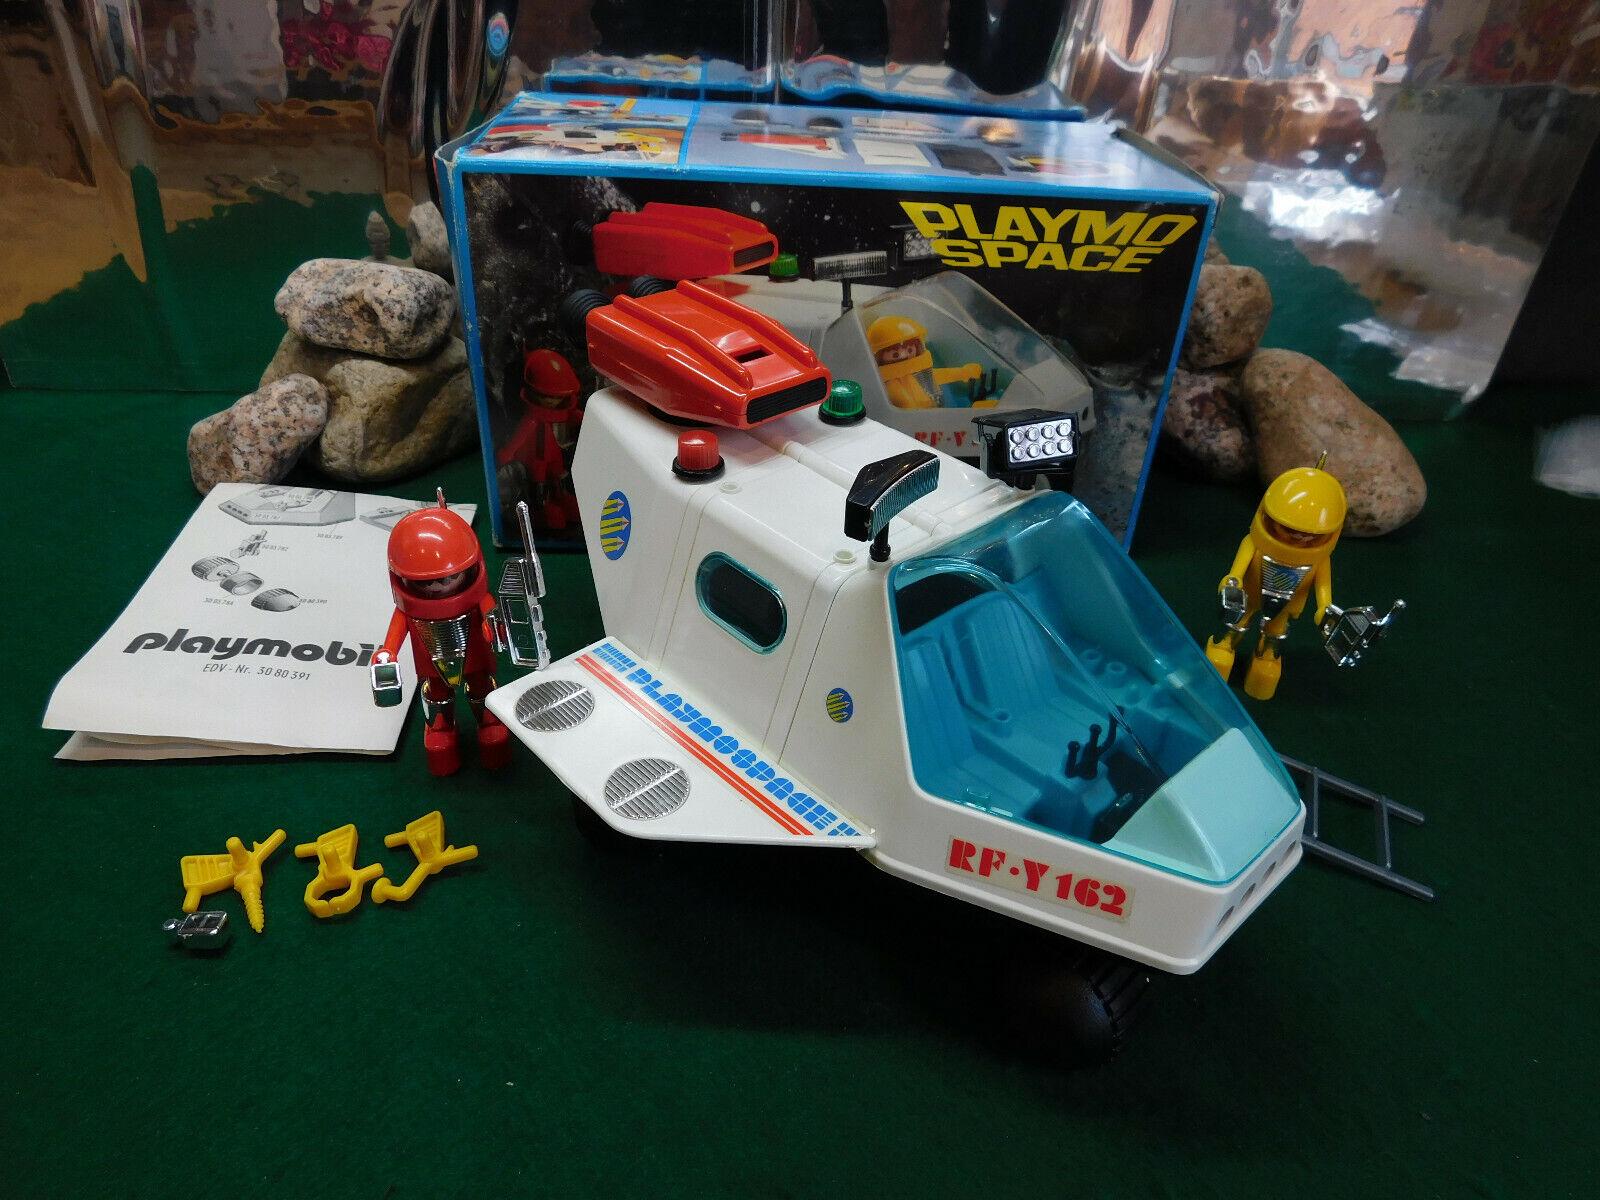 Playmobil Rarität Raumfähre 3534-A 1980 III Komplett-Set mit BA und OVP